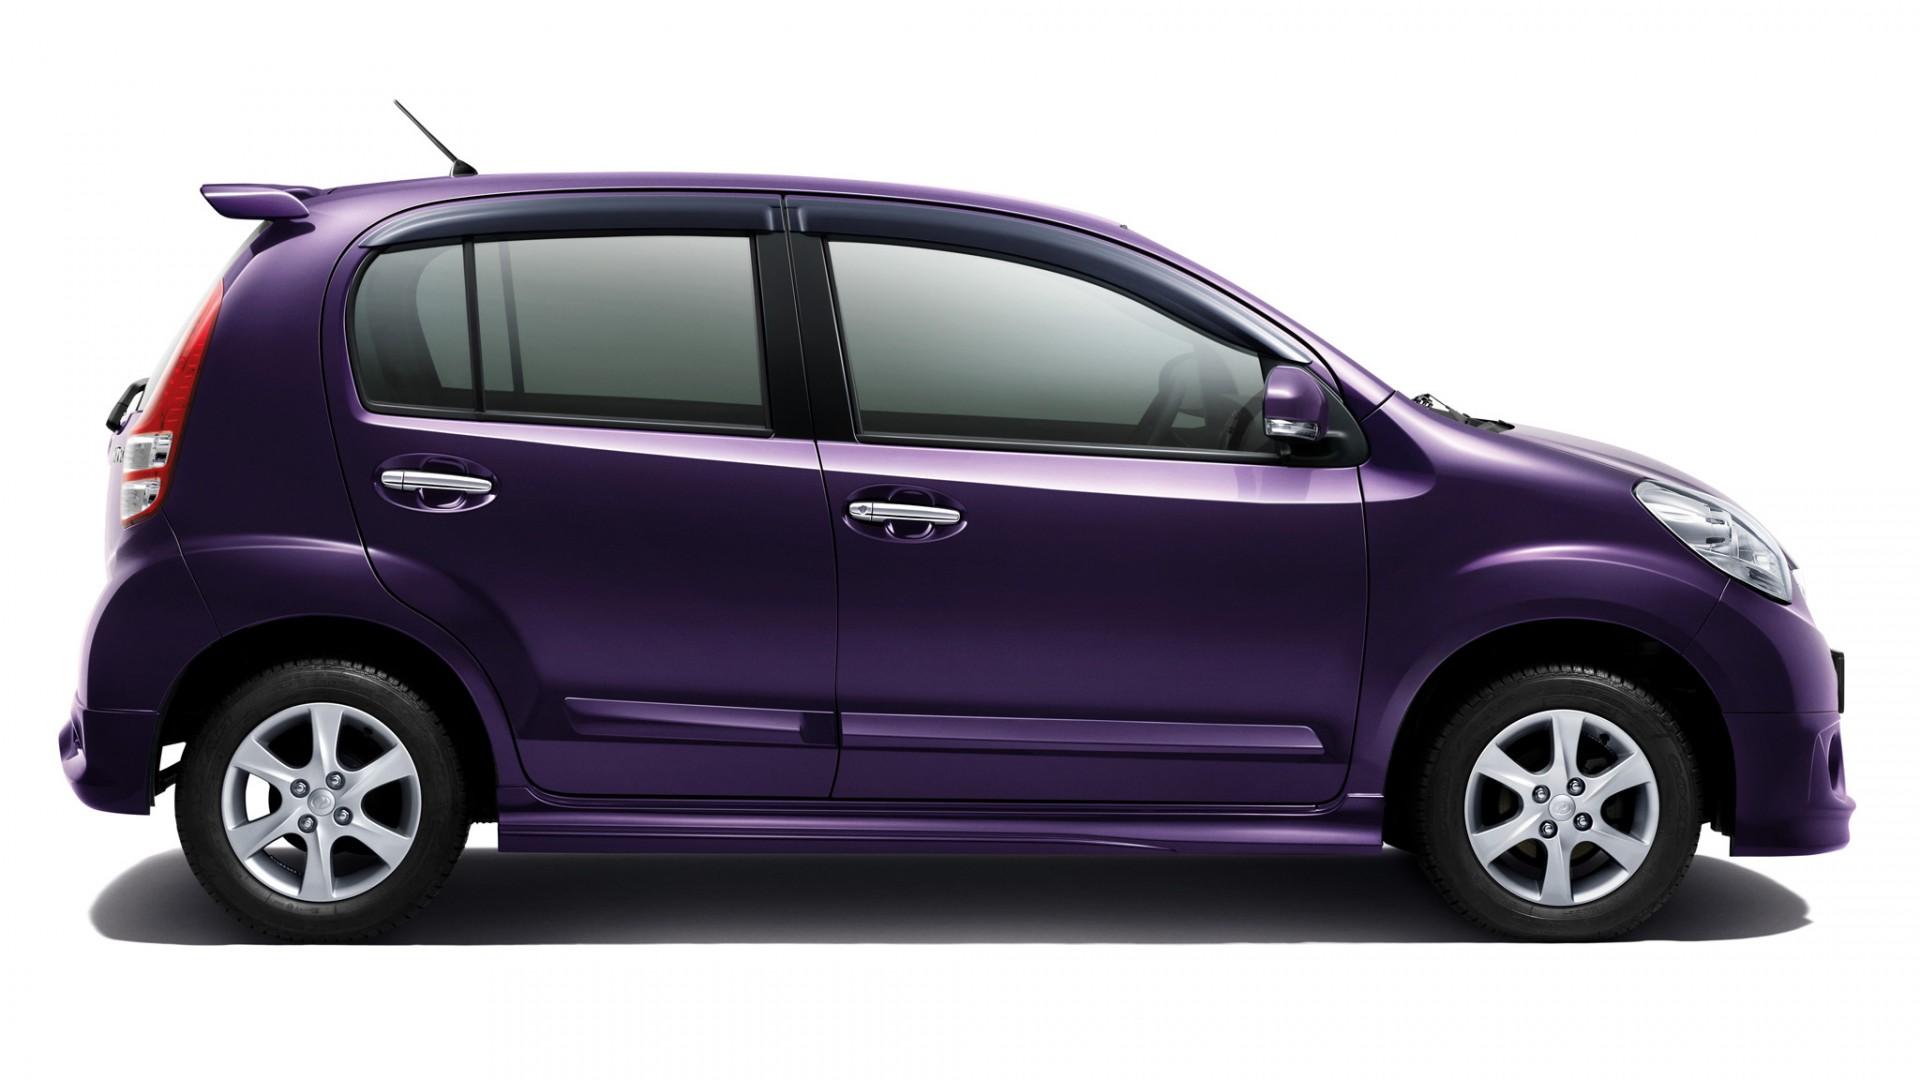 2011 Perodua MyVi Elegance side   Car  free download HD Wallpaper